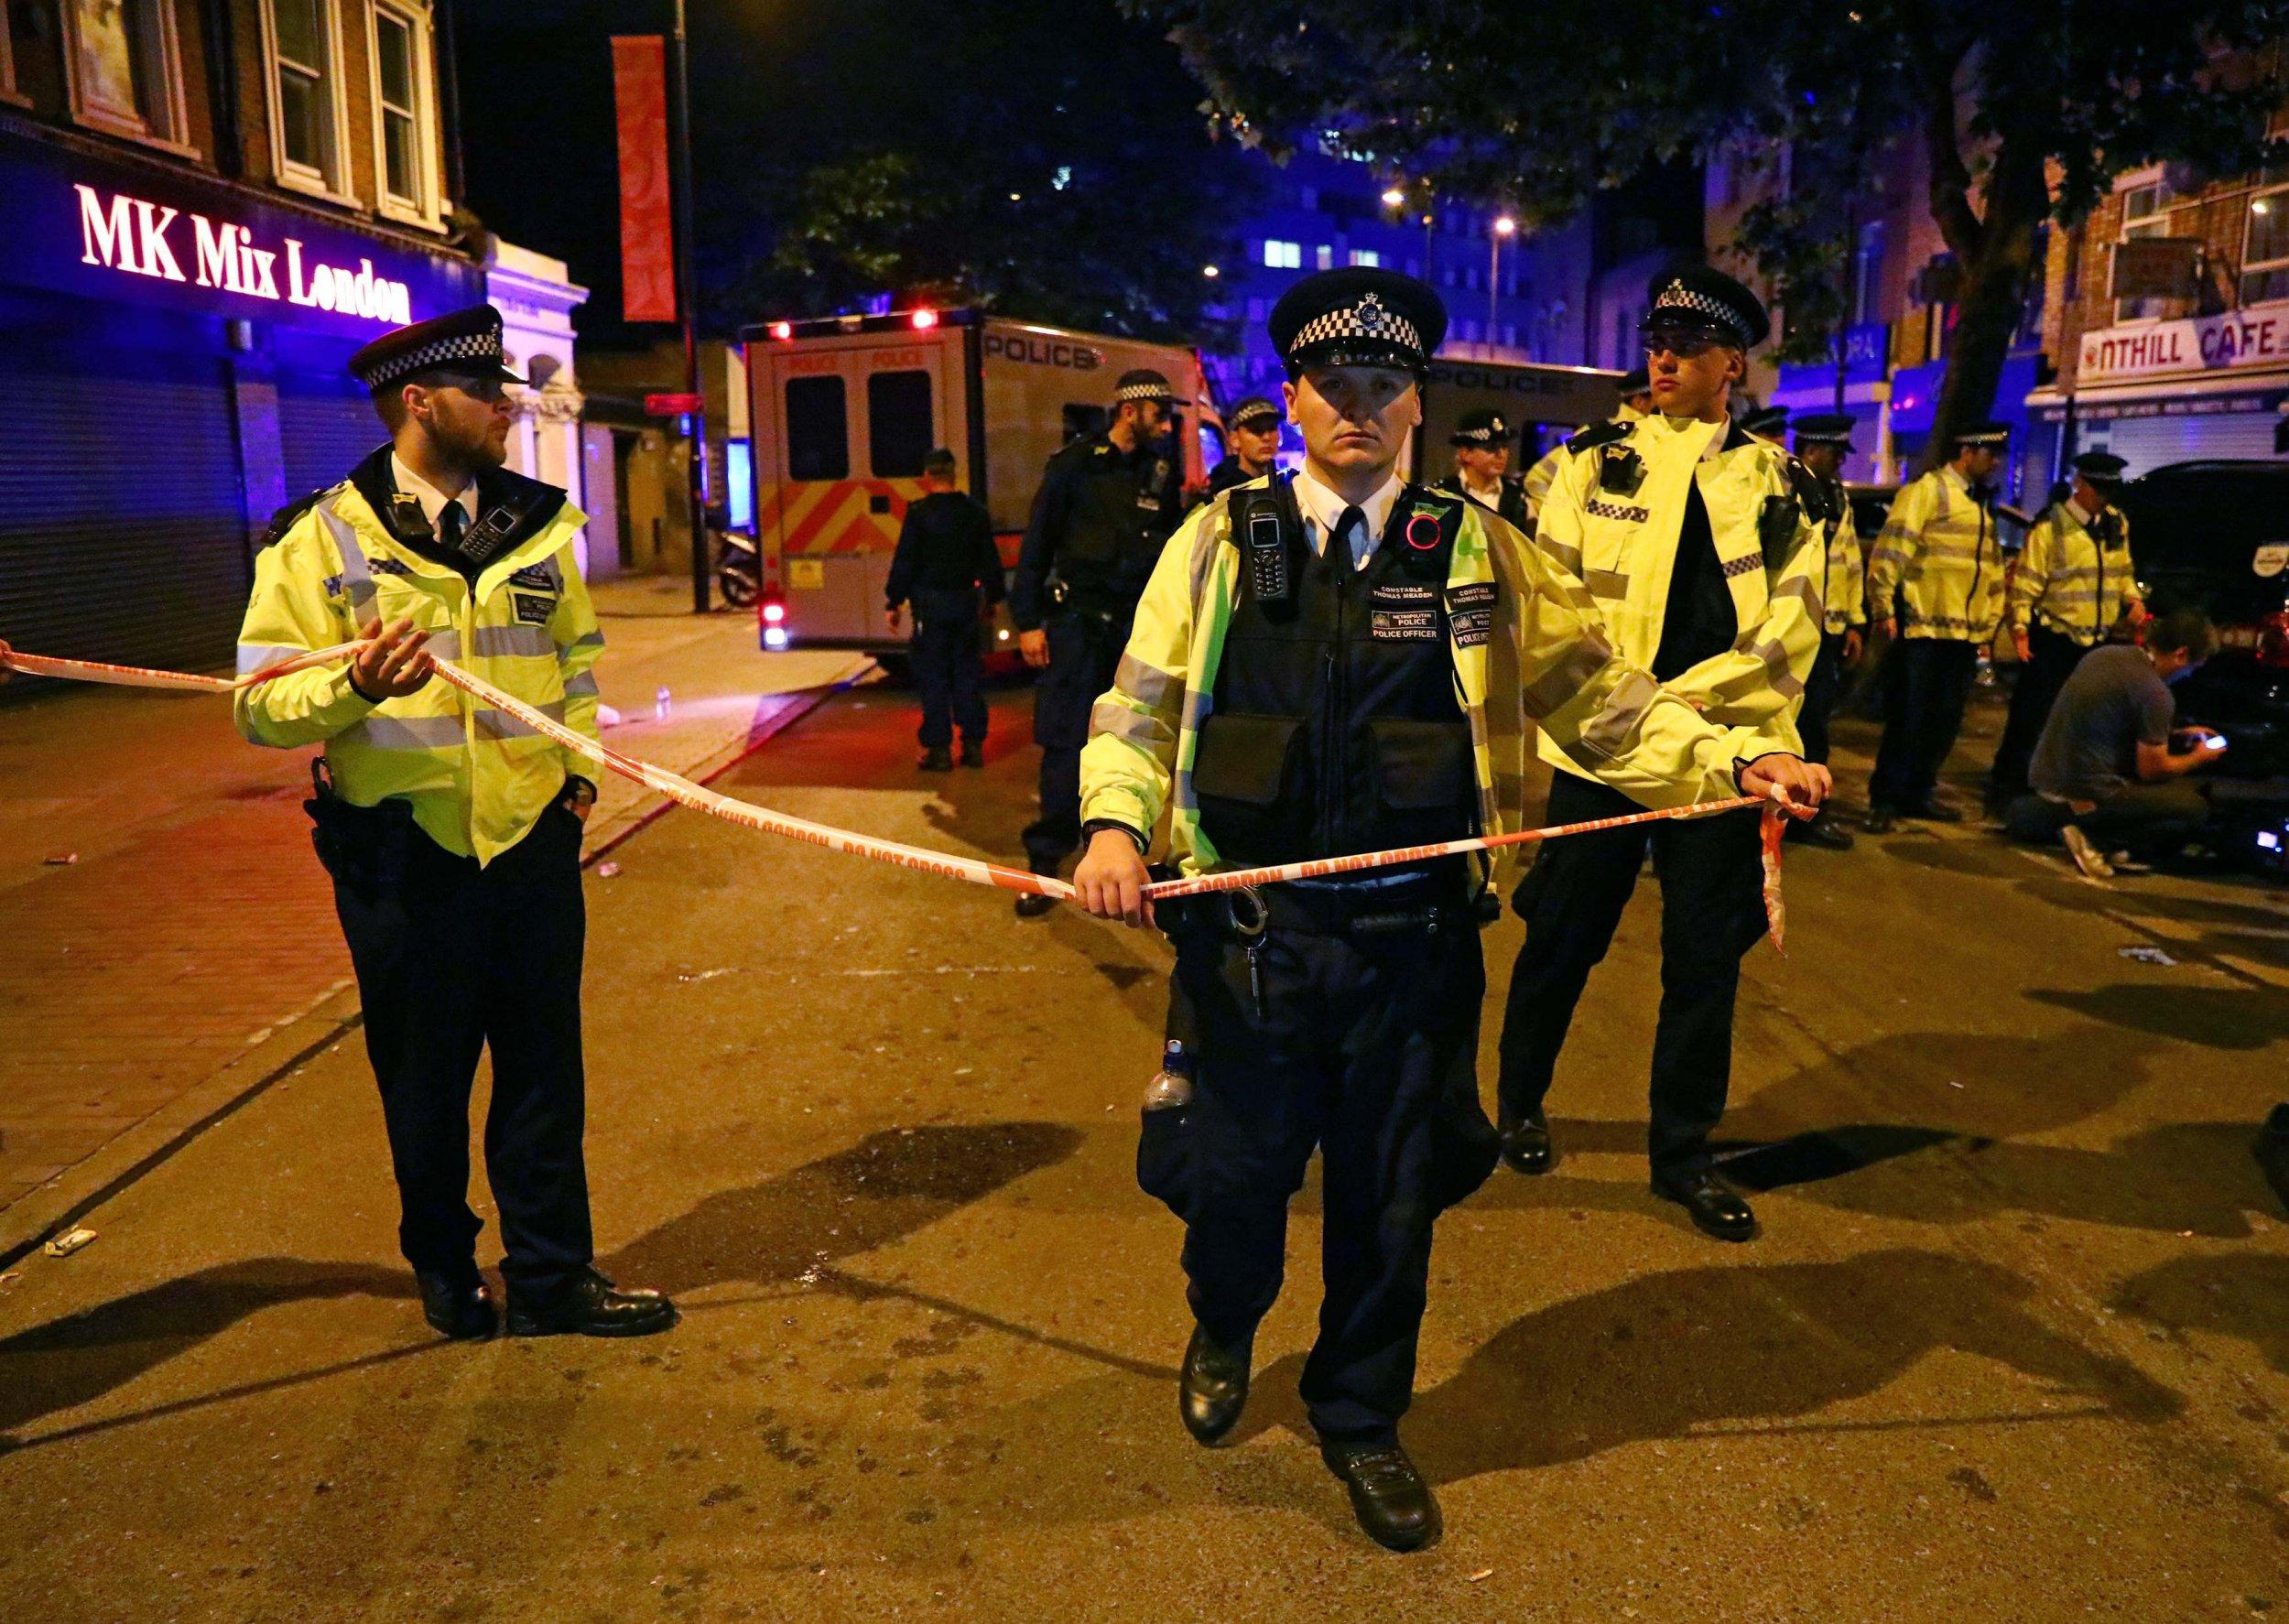 Muslim Council of Britain condemns Finsbury Park mosque attack